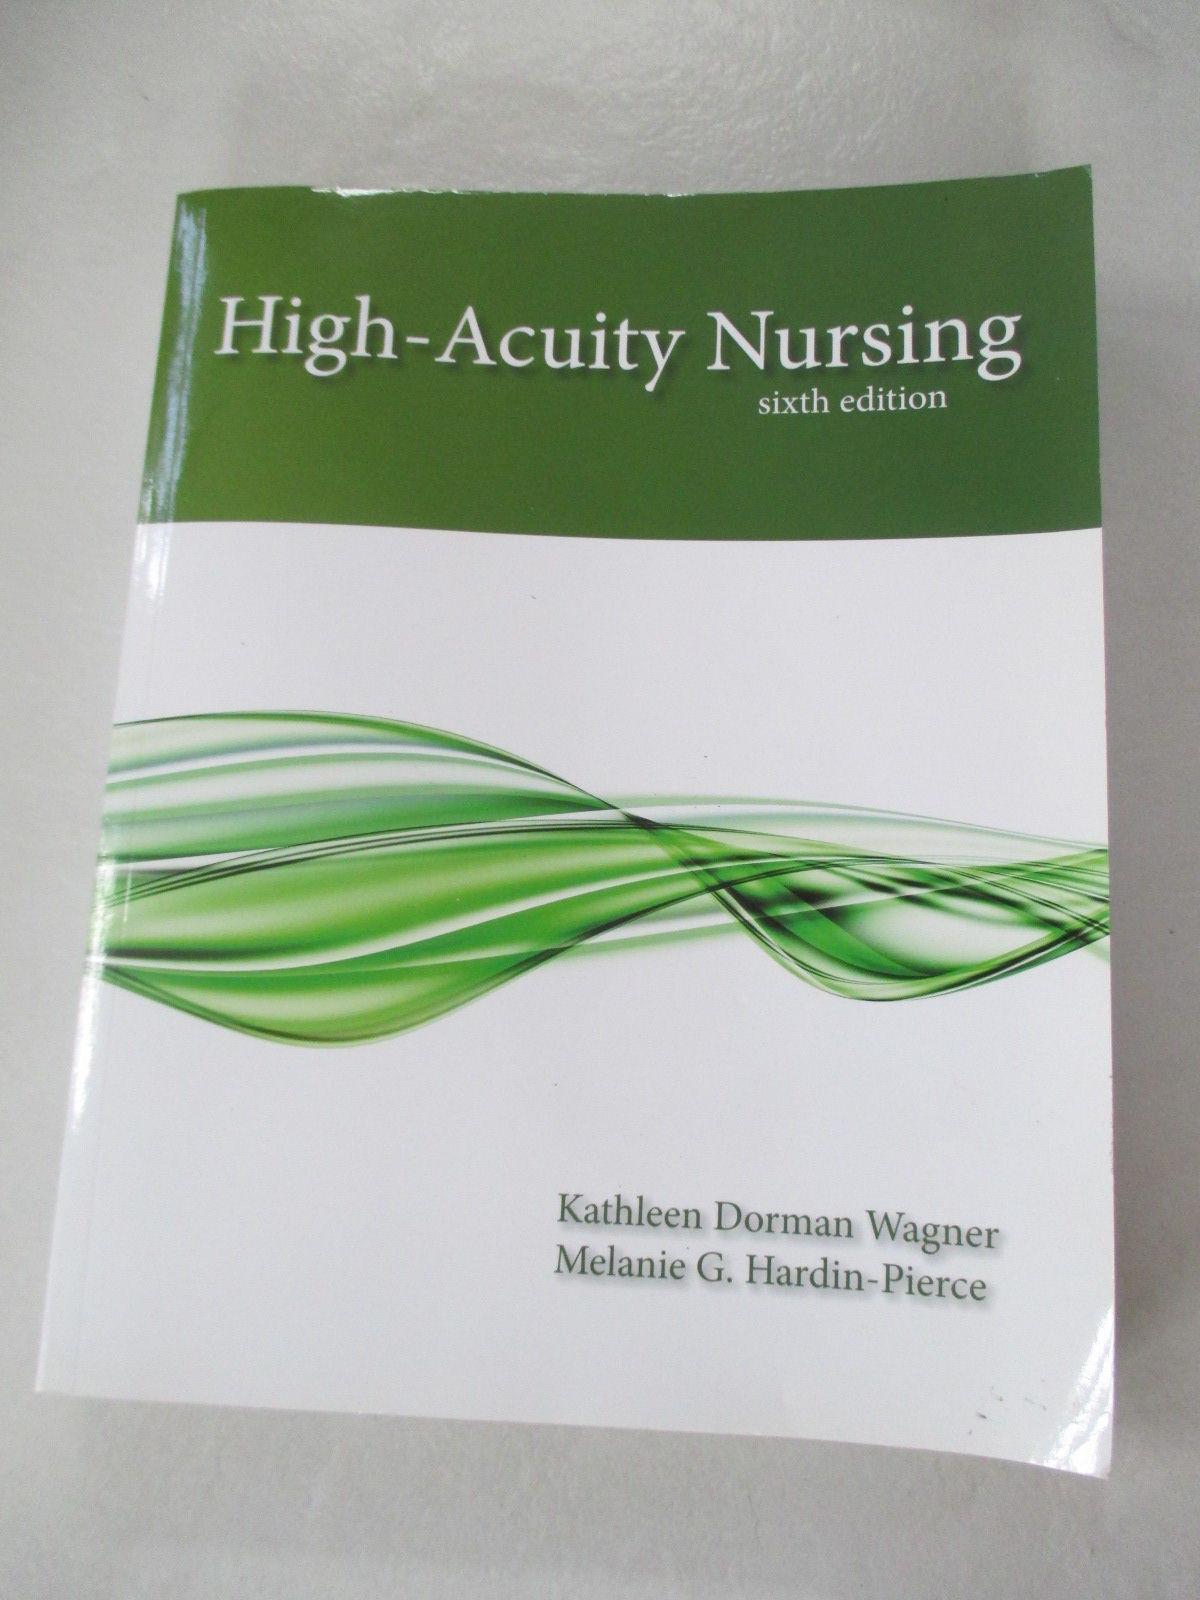 9780133026924 High Acuity Nursing 6th Edition By Karen Johnson